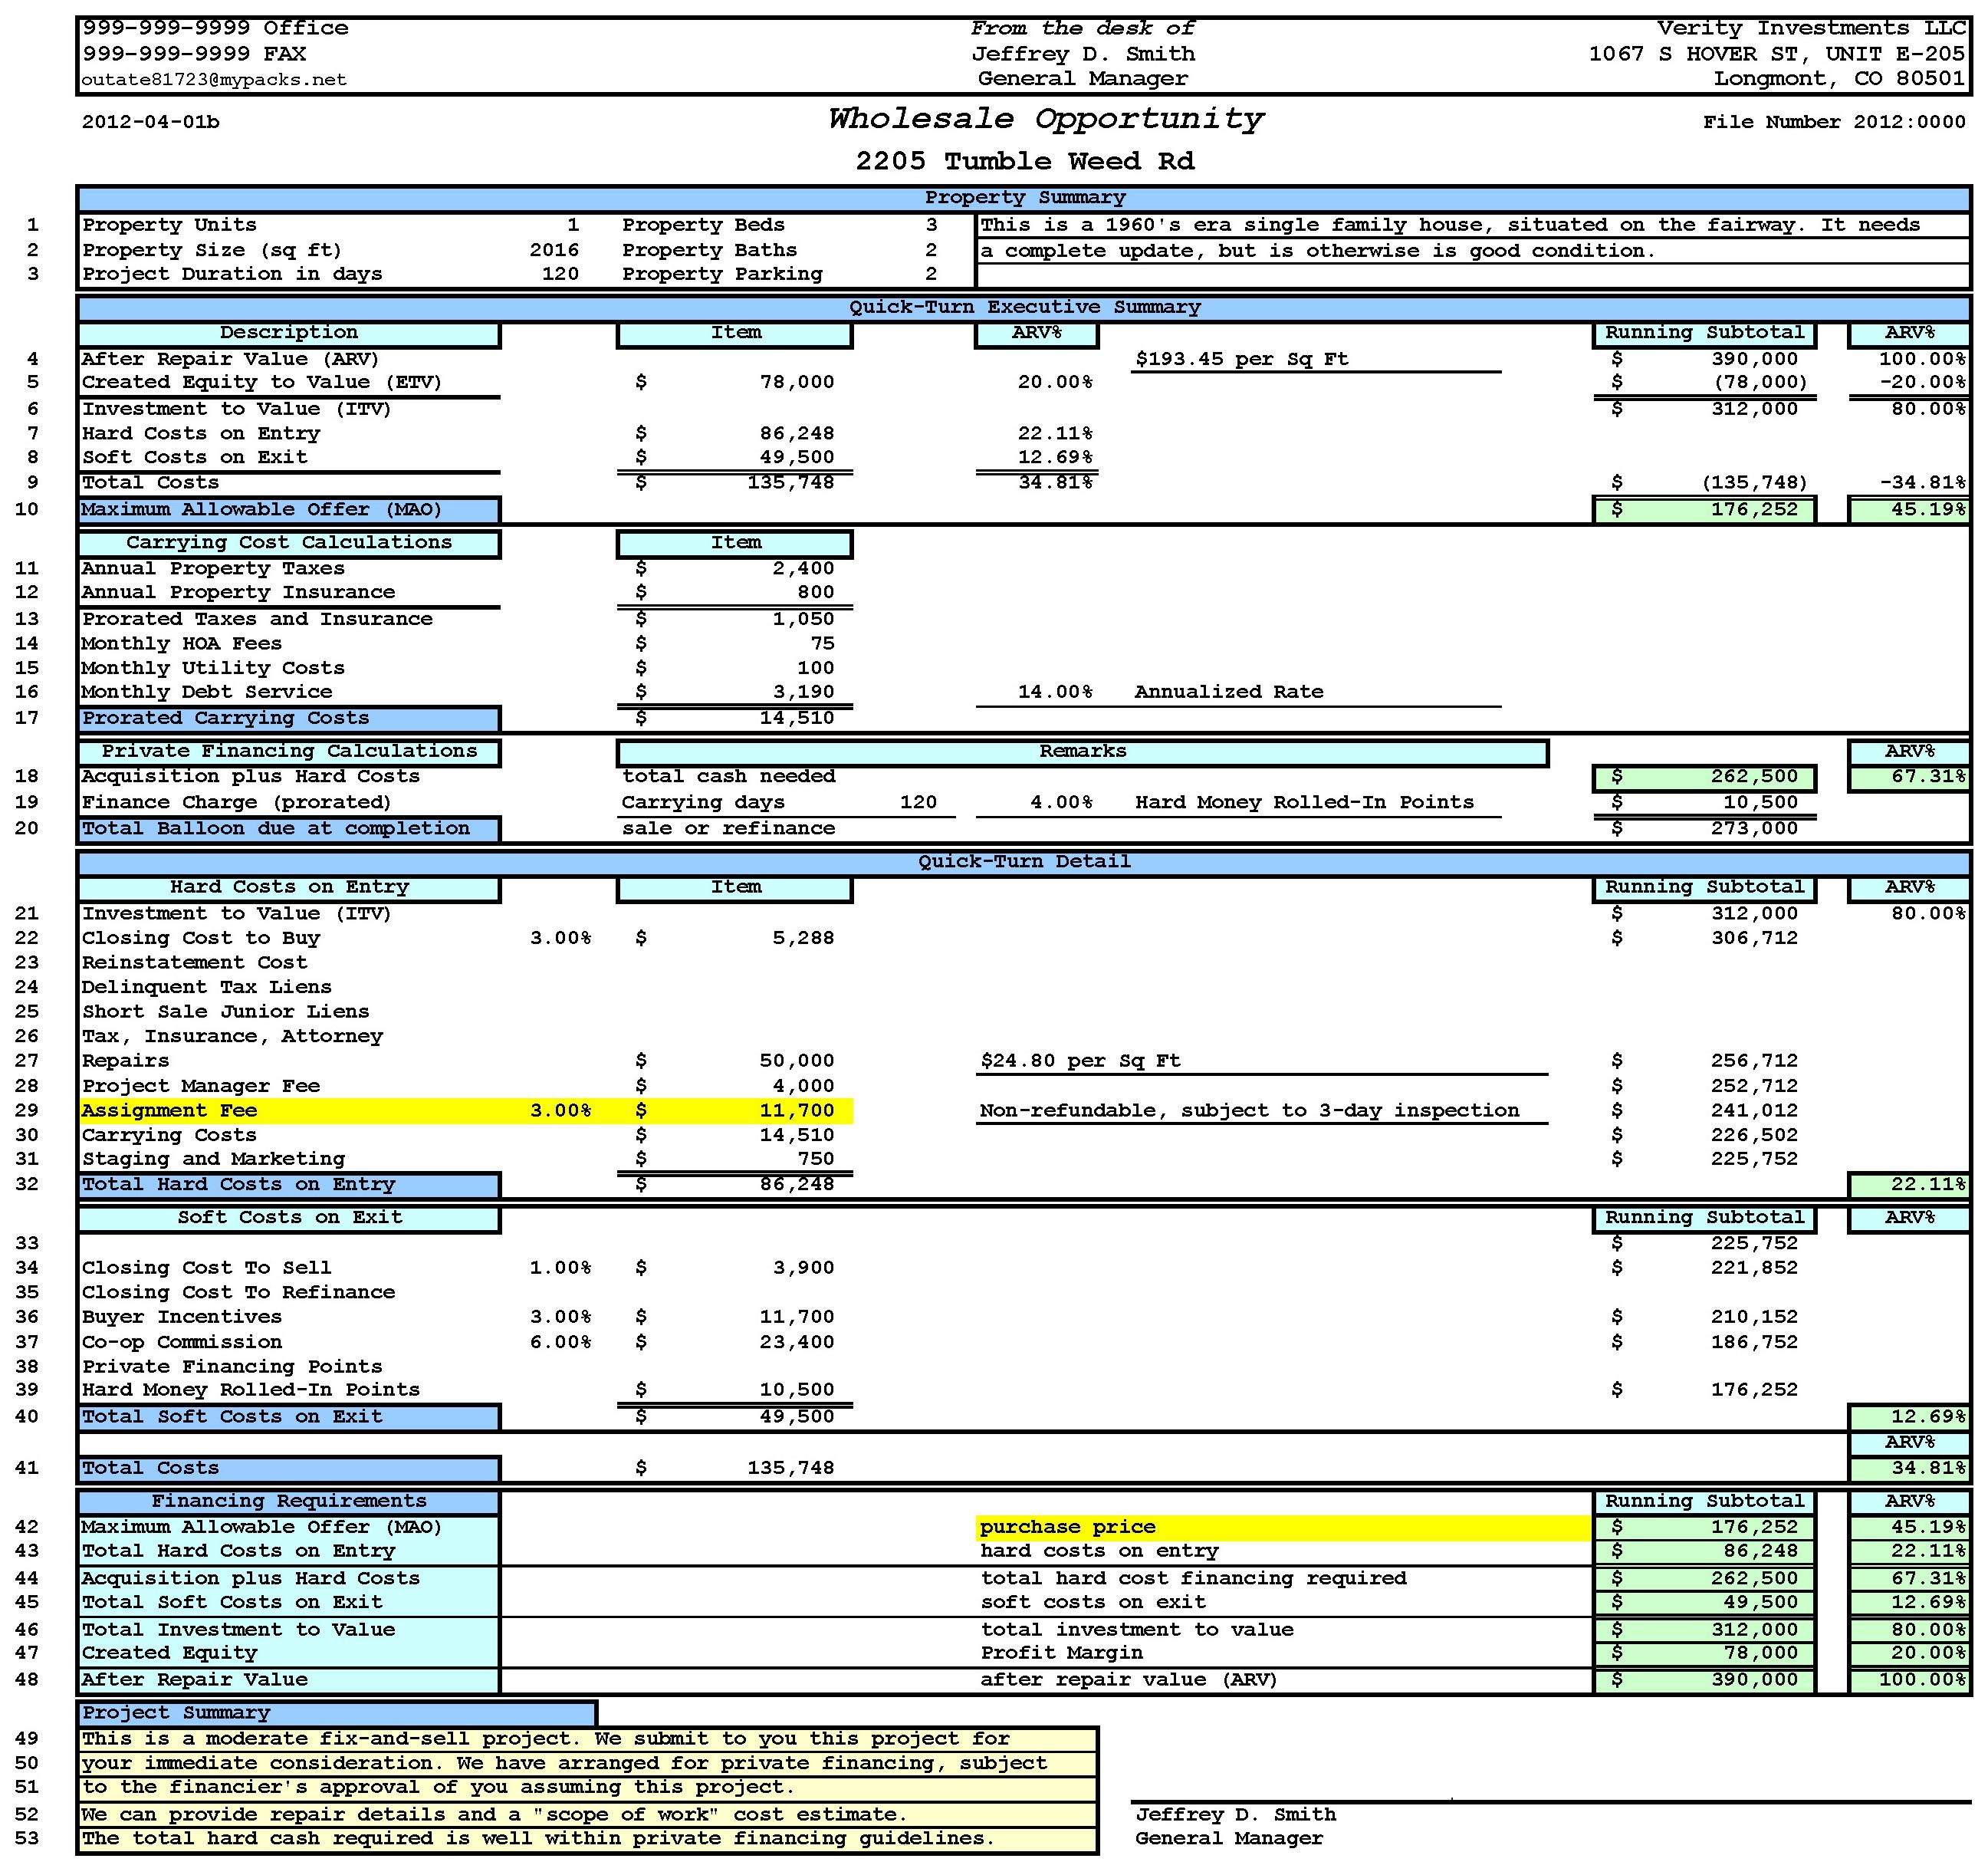 Financial Statementysis Spreadsheet